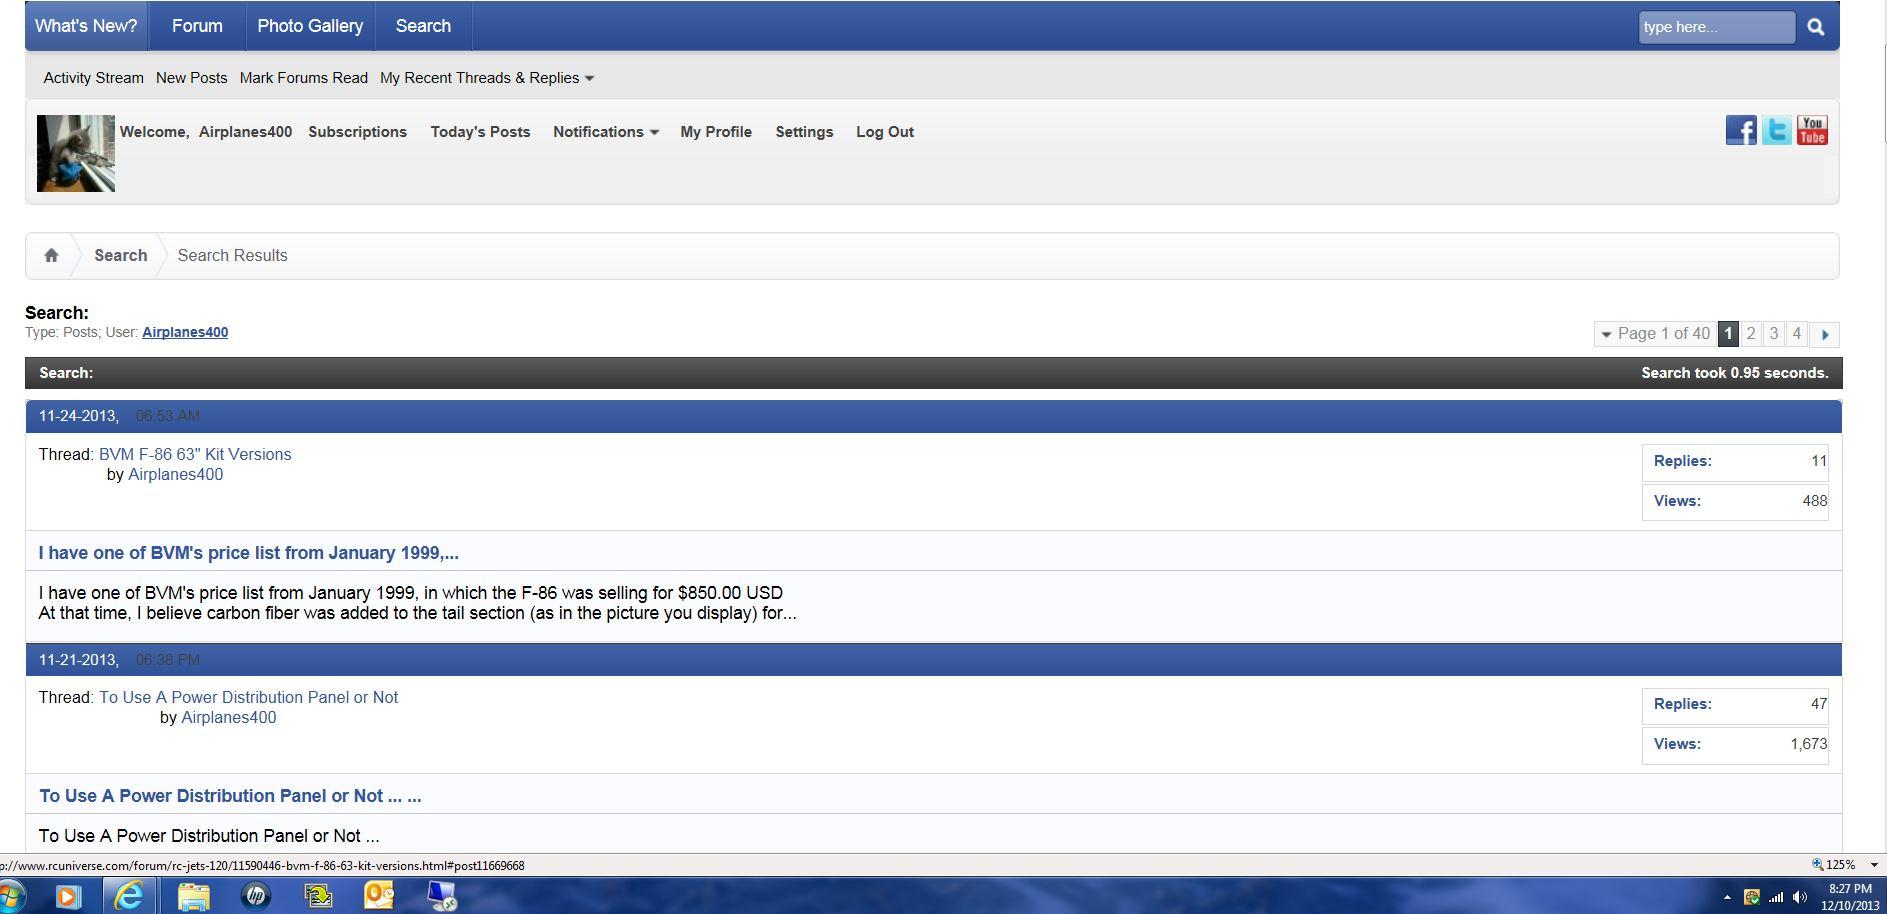 Click image for larger version  Name:LastestPosts.JPG Views:9 Size:176.4 KB ID:1946622